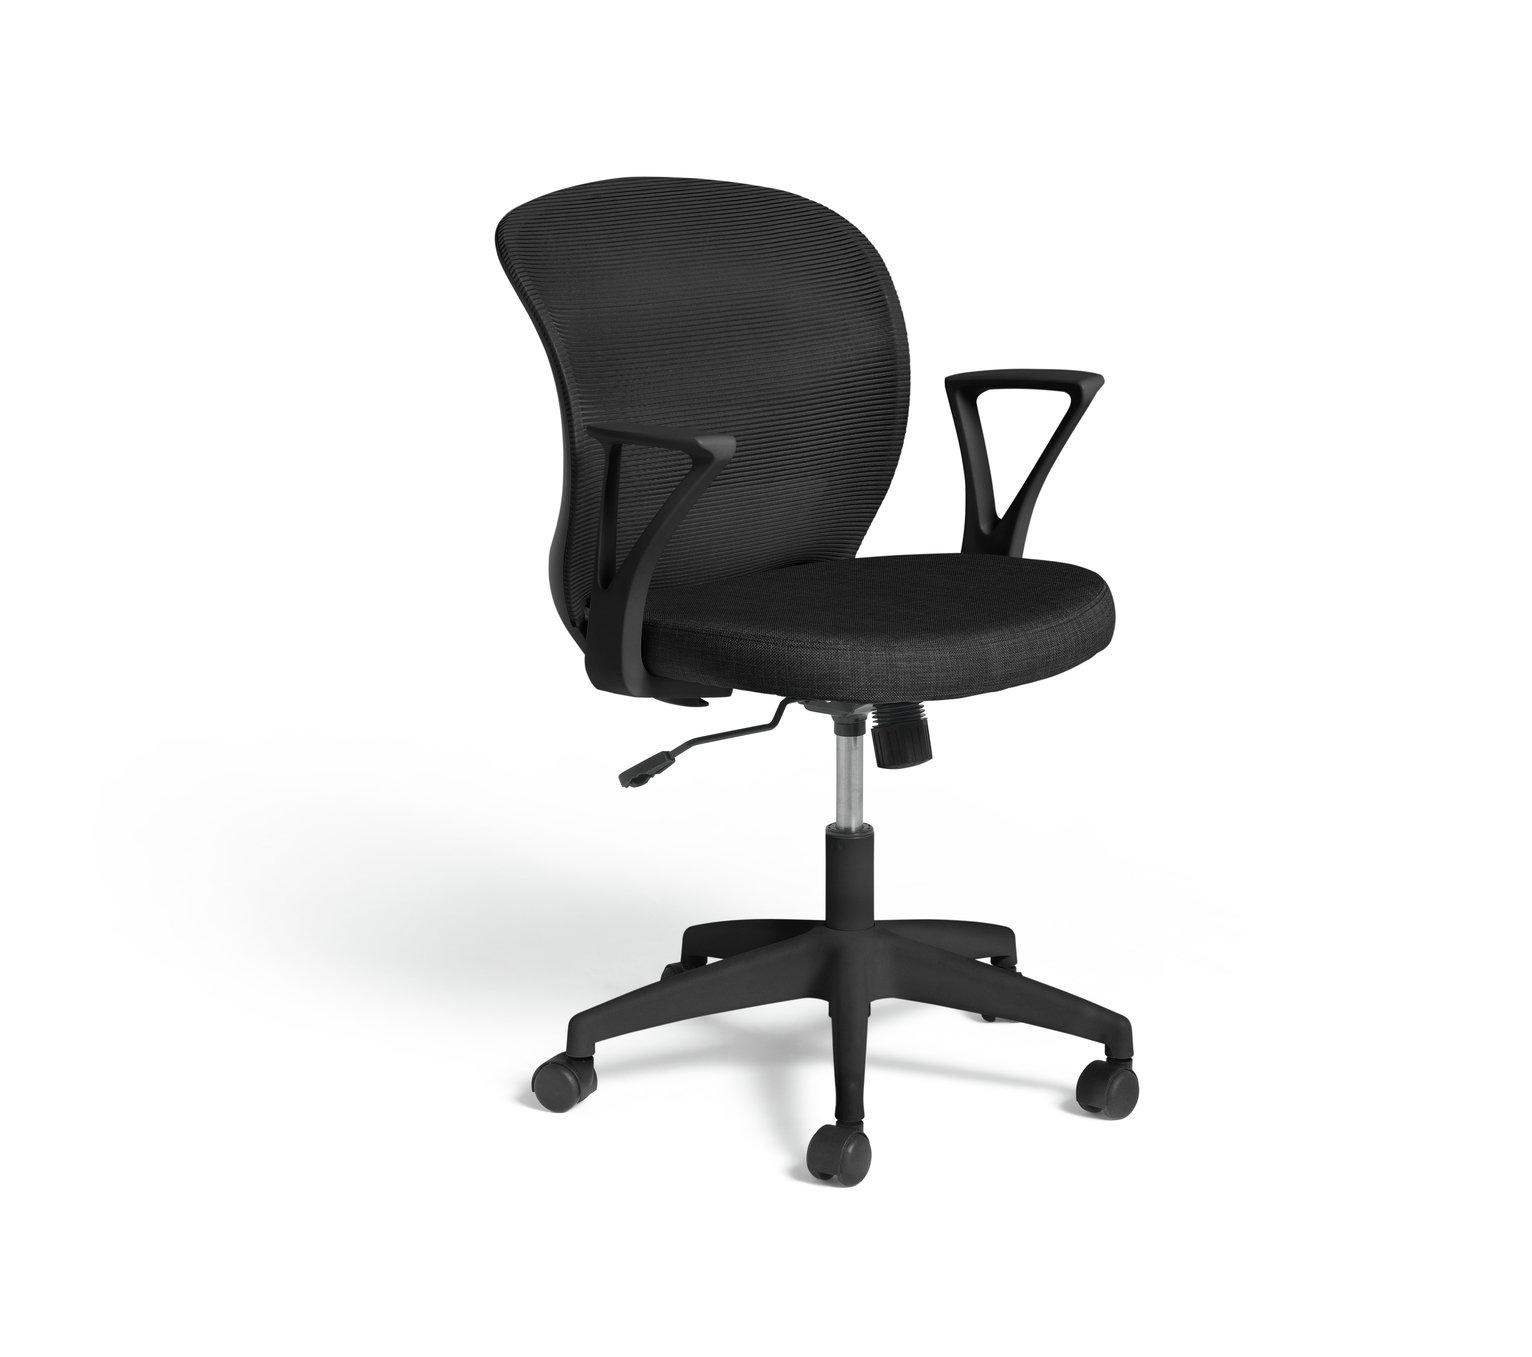 Habitat Beck Mesh Office Chair - Black